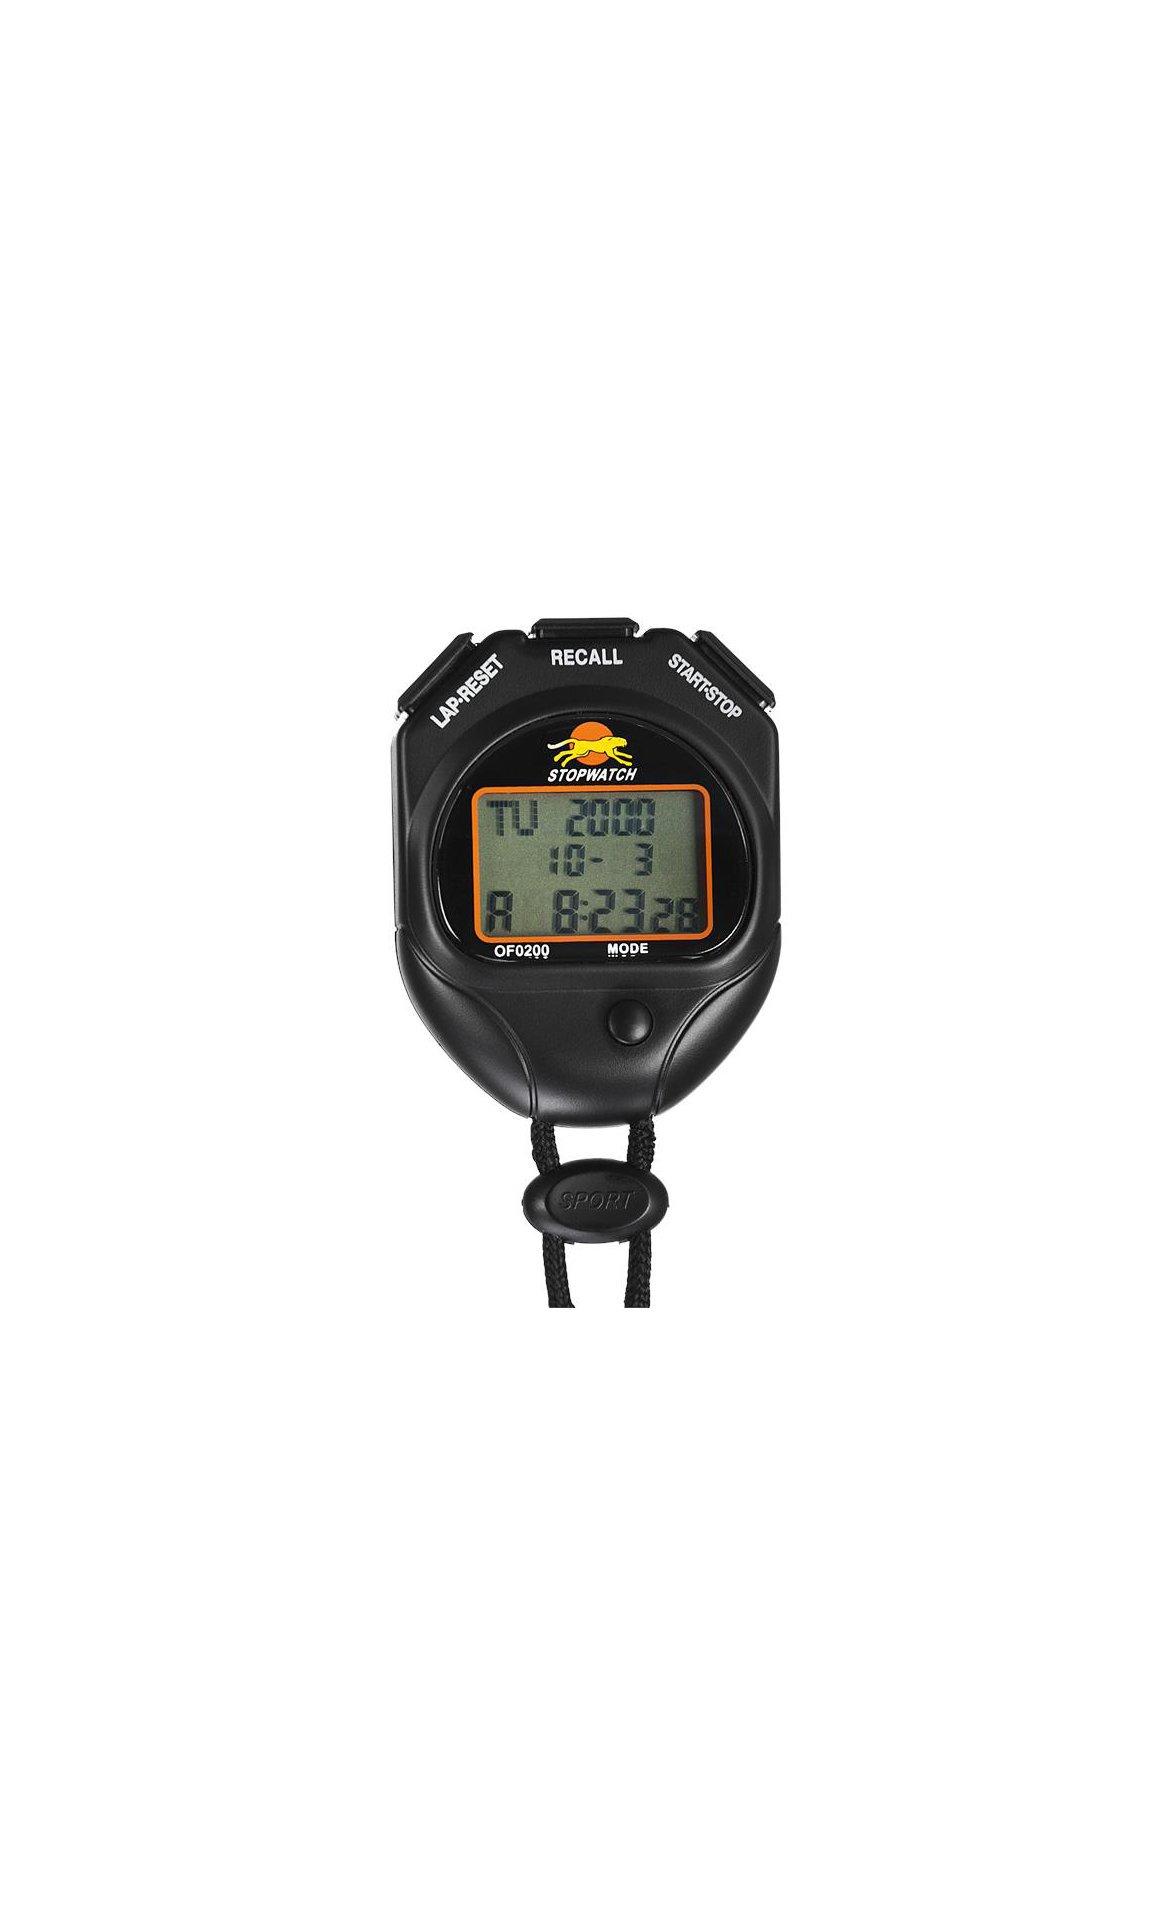 Cronometro Profissional Quartz Of0200 Guepardo